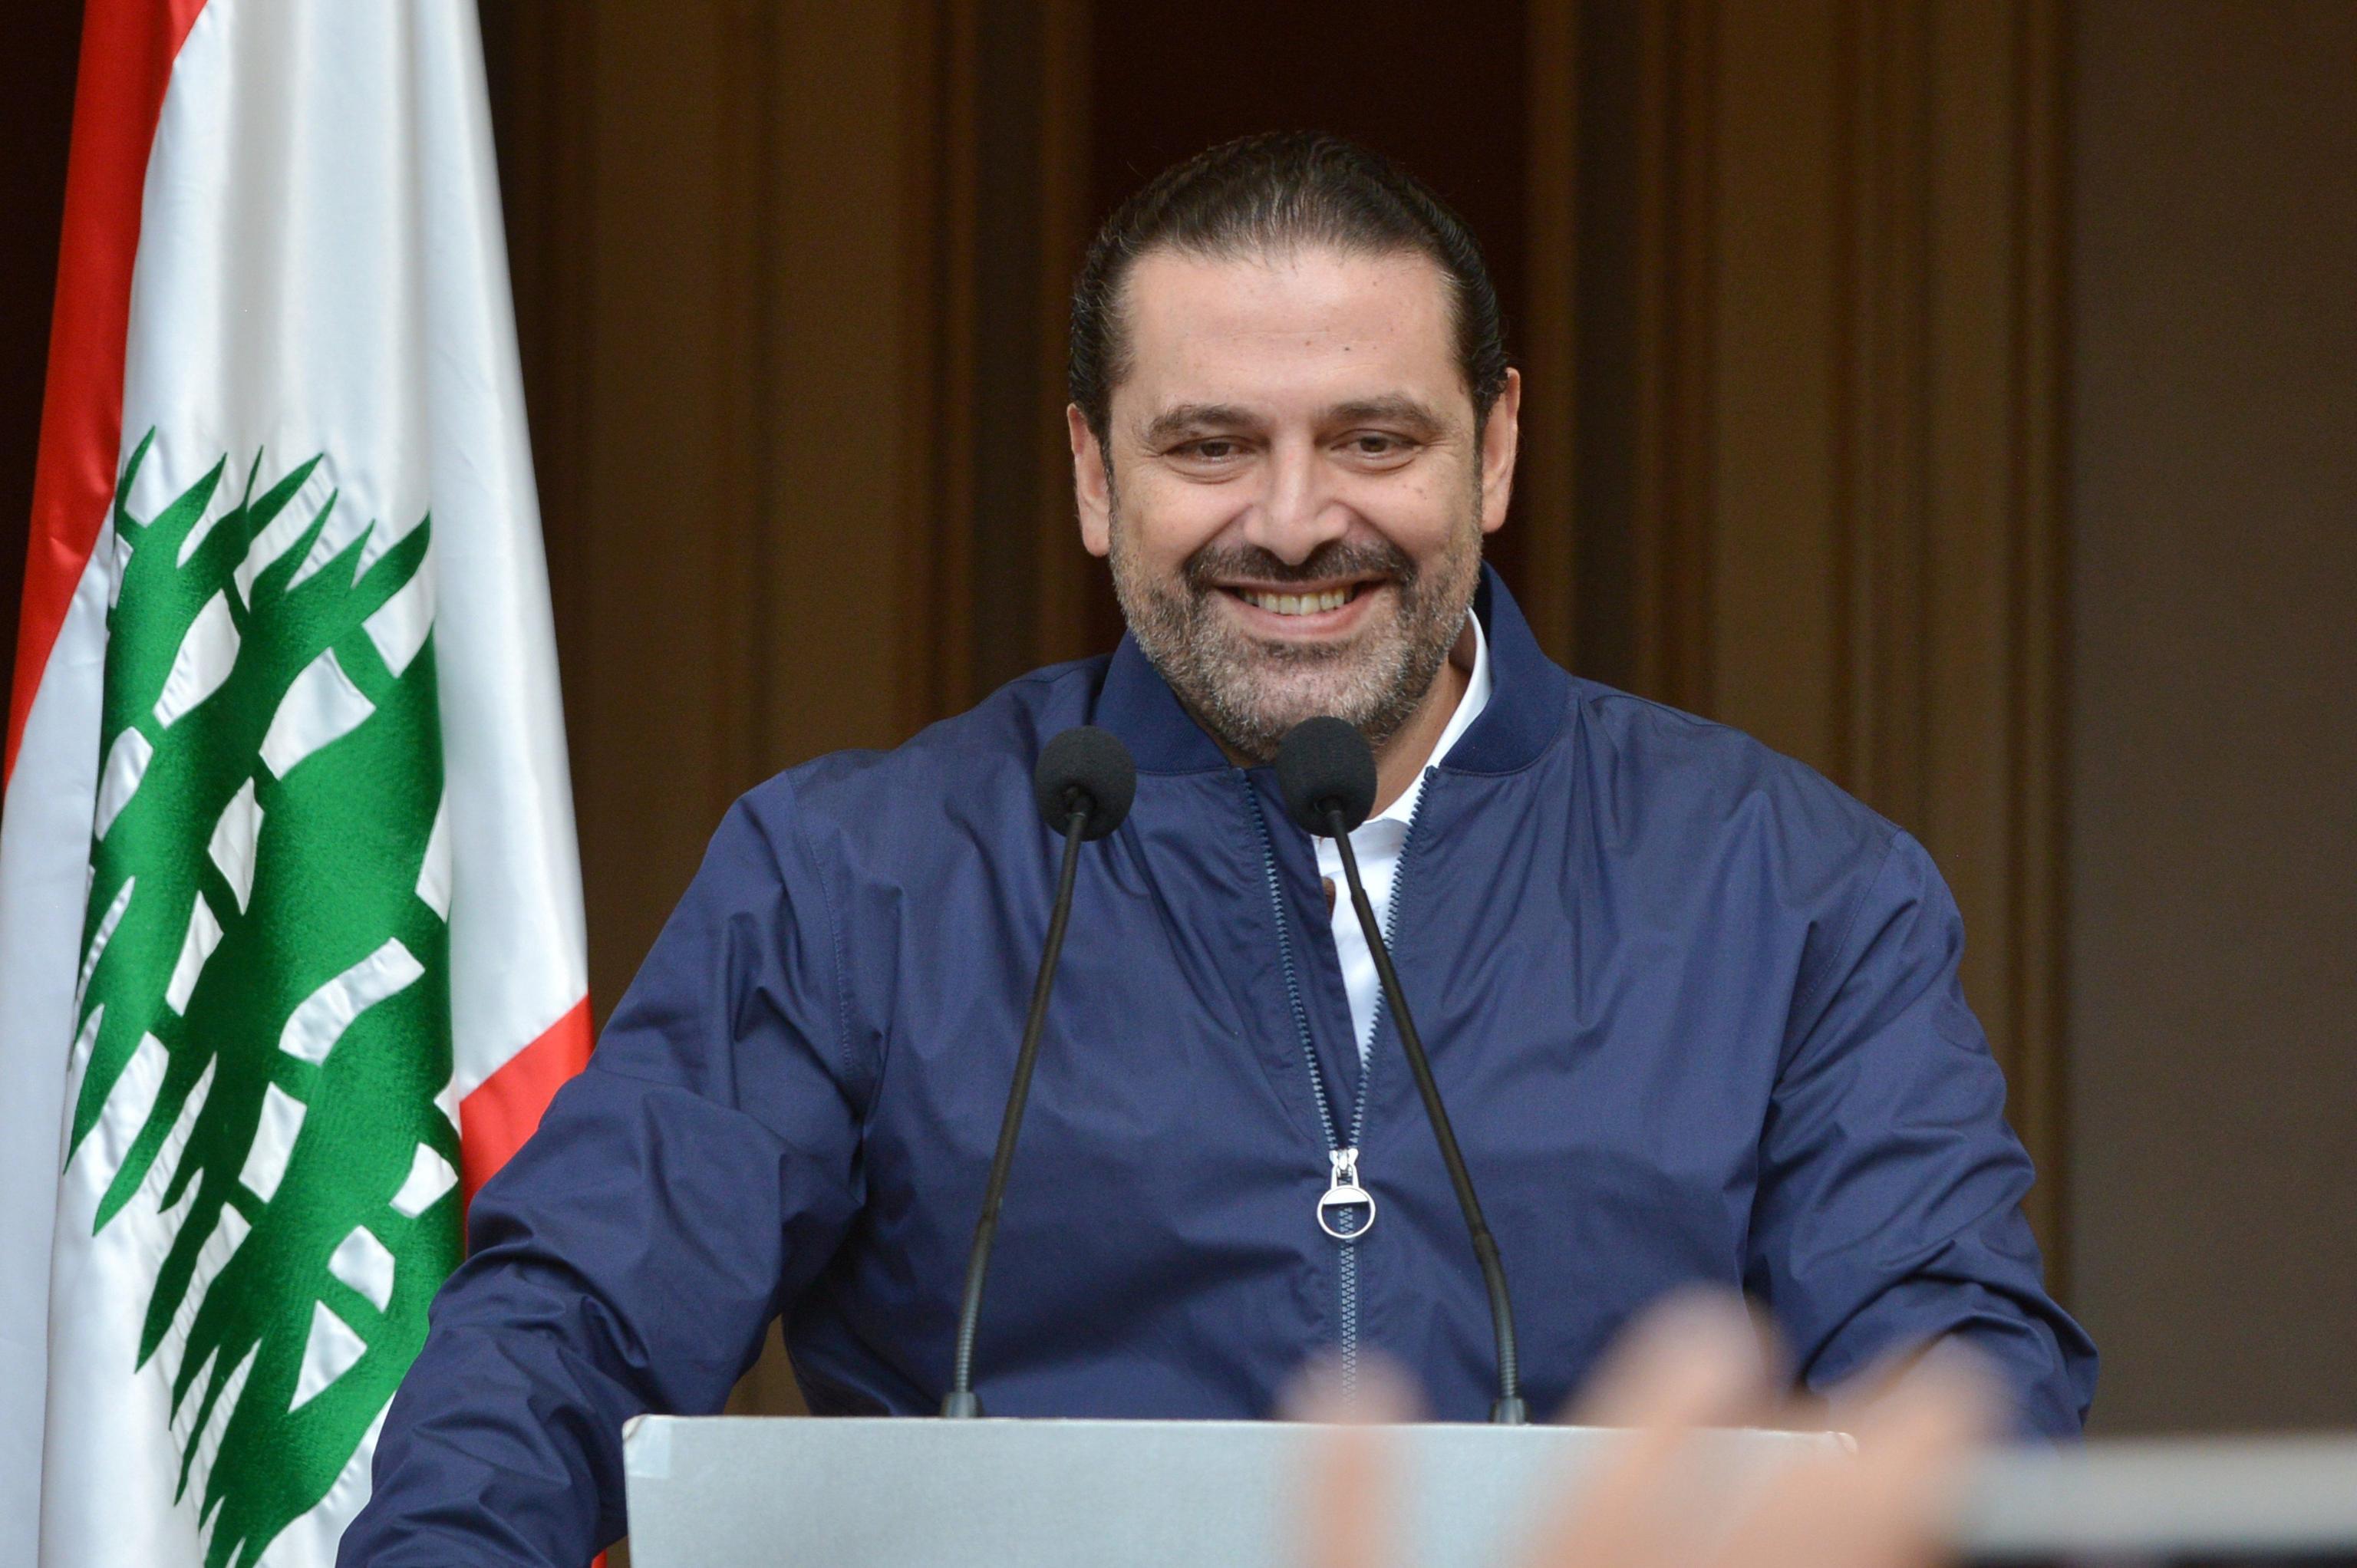 Hariri ritira ufficialmente dimissioni